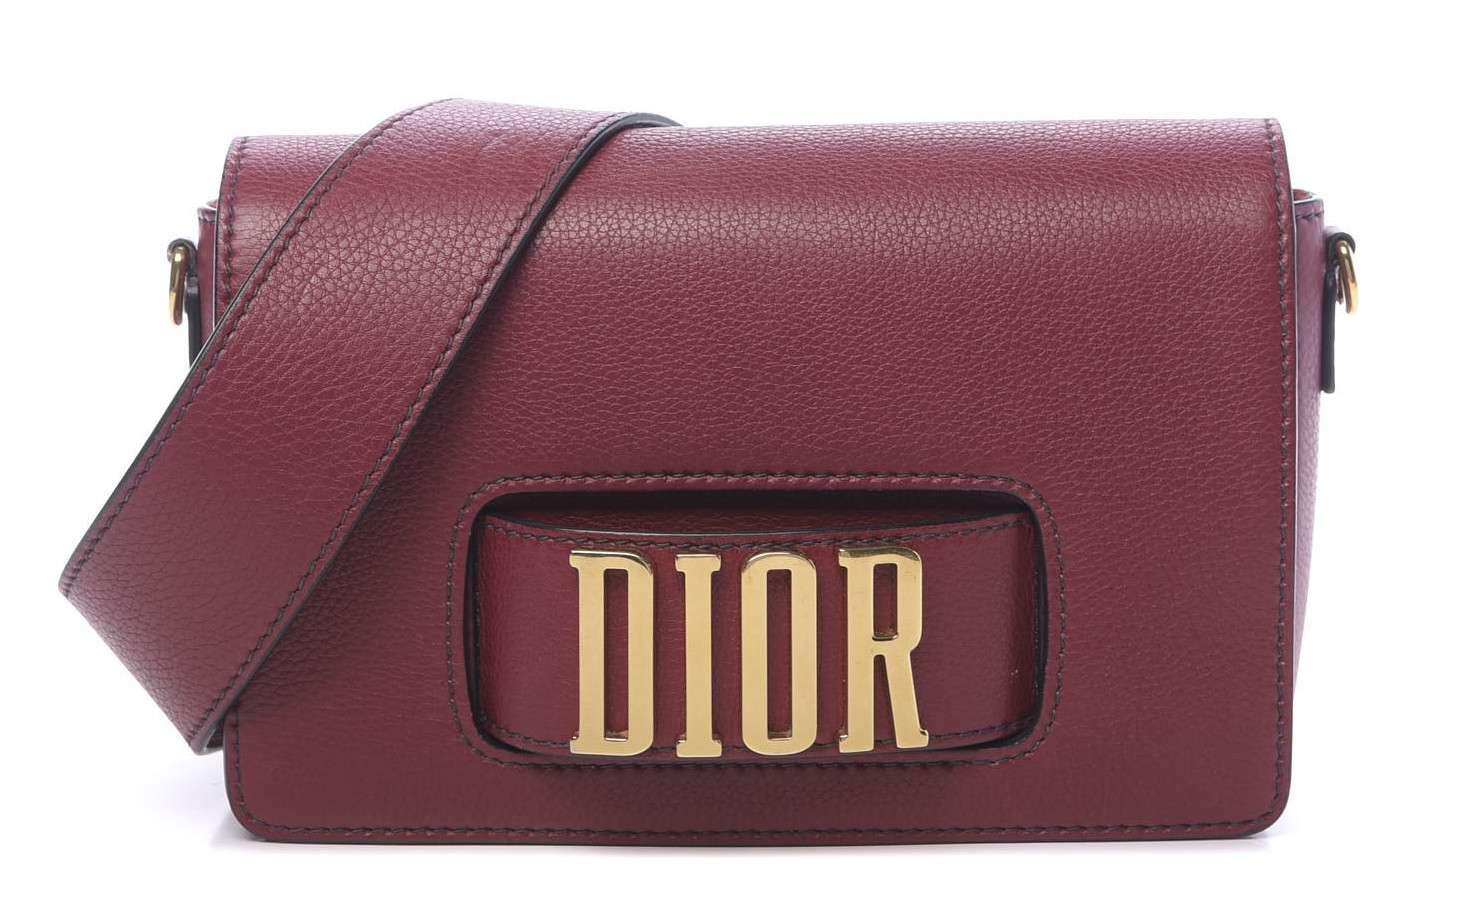 Dior Dio(r)evolution Flap Bag